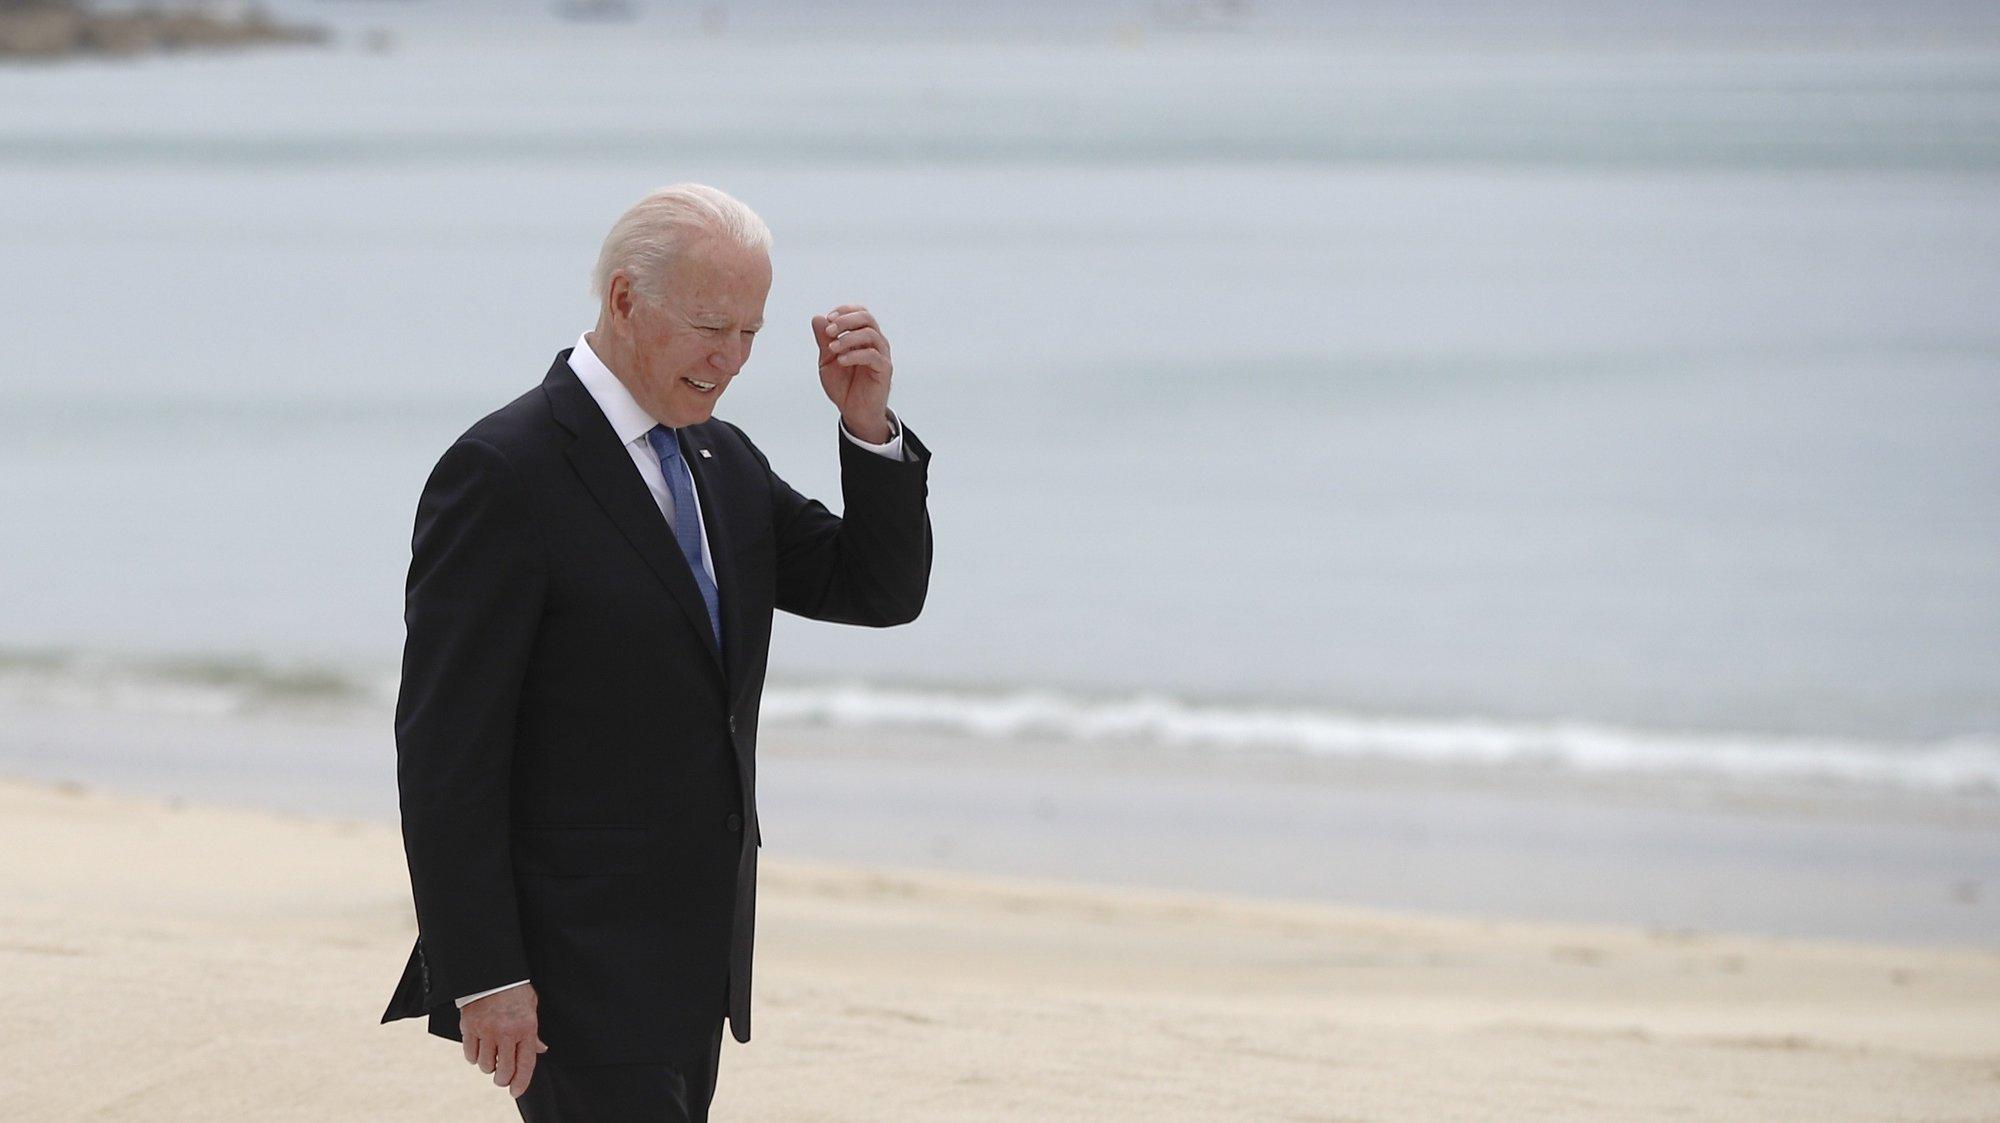 epa09262263 US President Joe Biden walks along the boardwalk during the G7 summit in Carbis Bay, Cornwall, Britain, 11 June 2021.  EPA/PHIL NOBLE / POOL